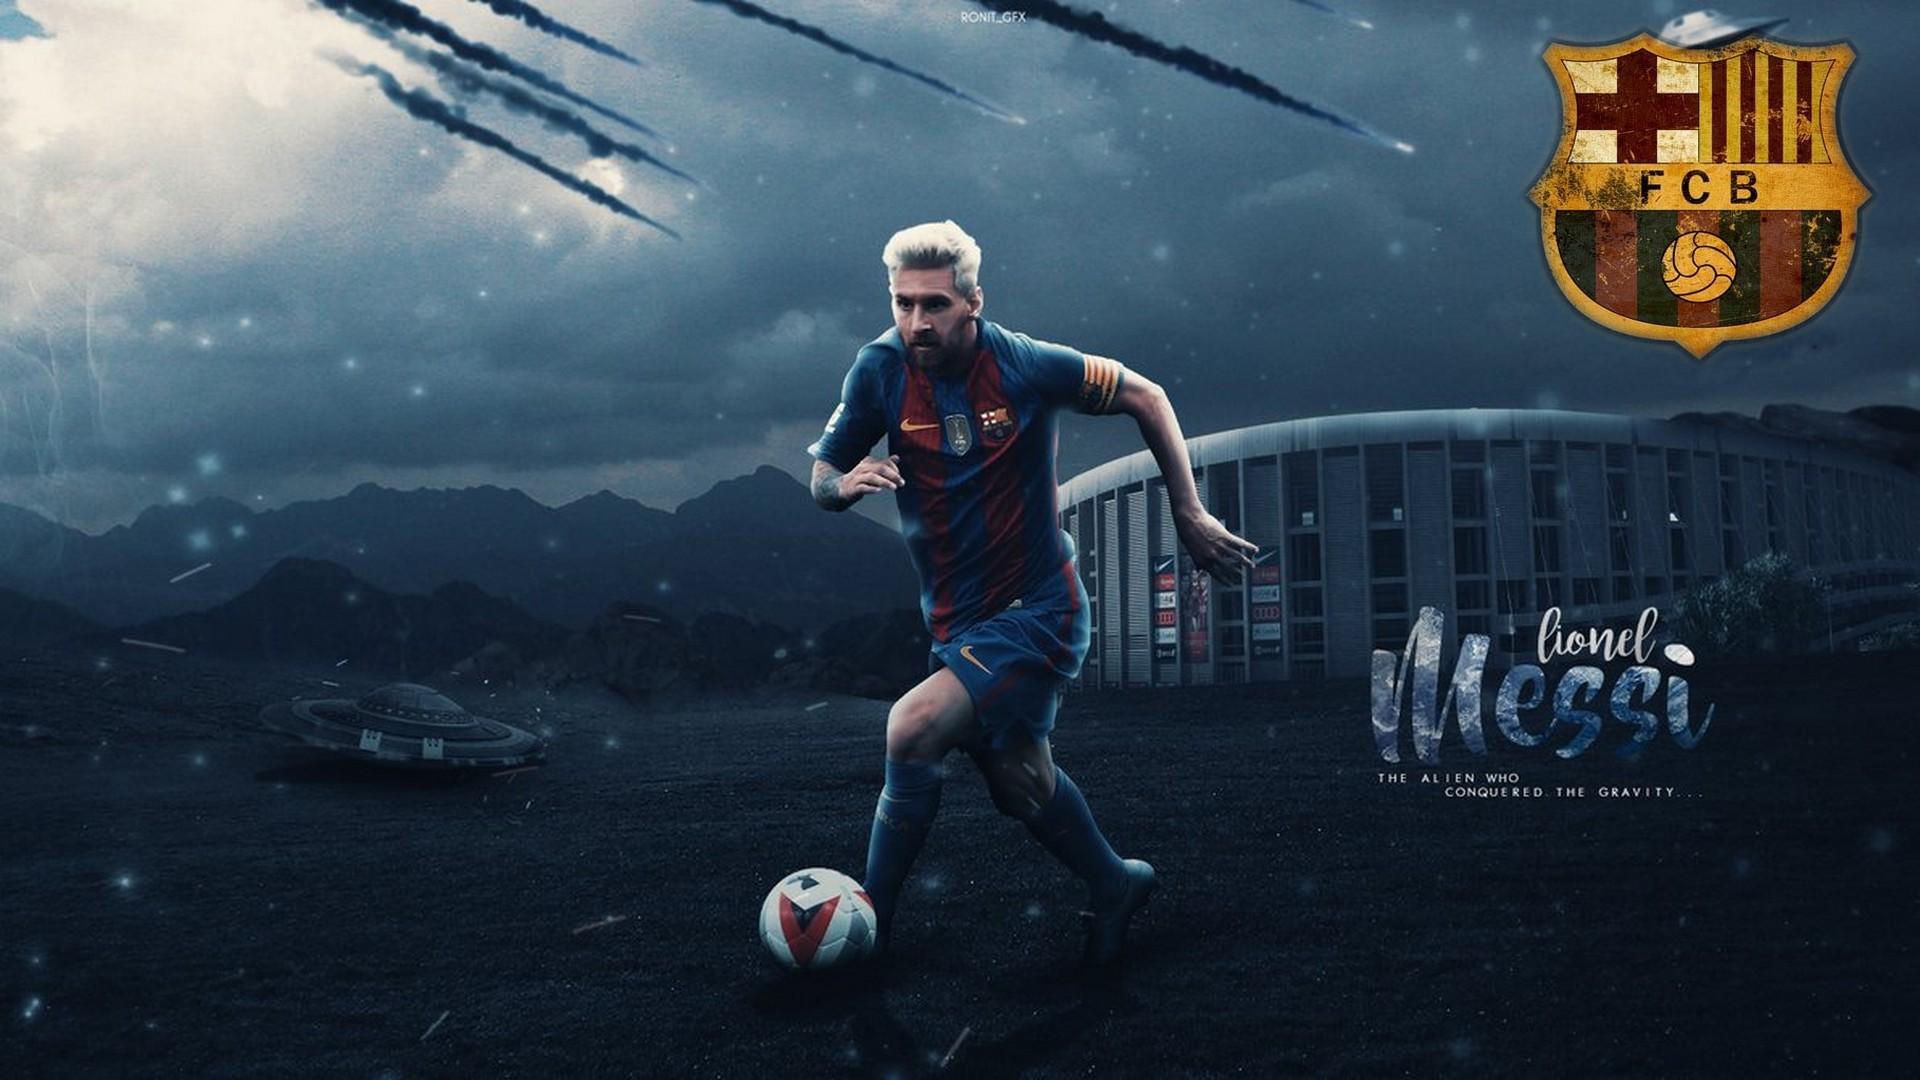 Hd Messi Backgrounds 2020 Football Wallpaper